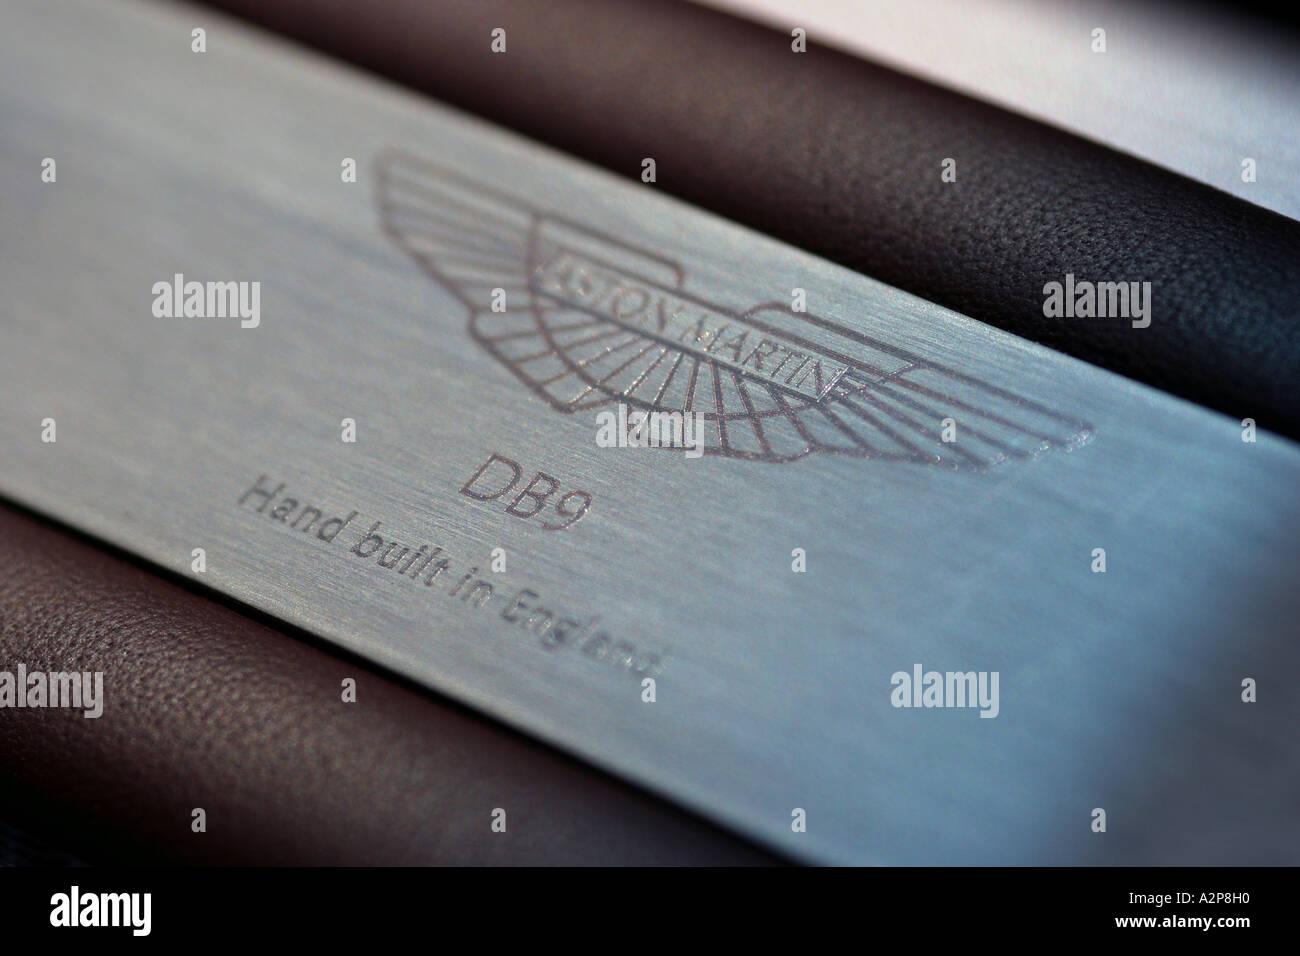 Hand Made in England badge Aston Martin DB9 sports car - Stock Image